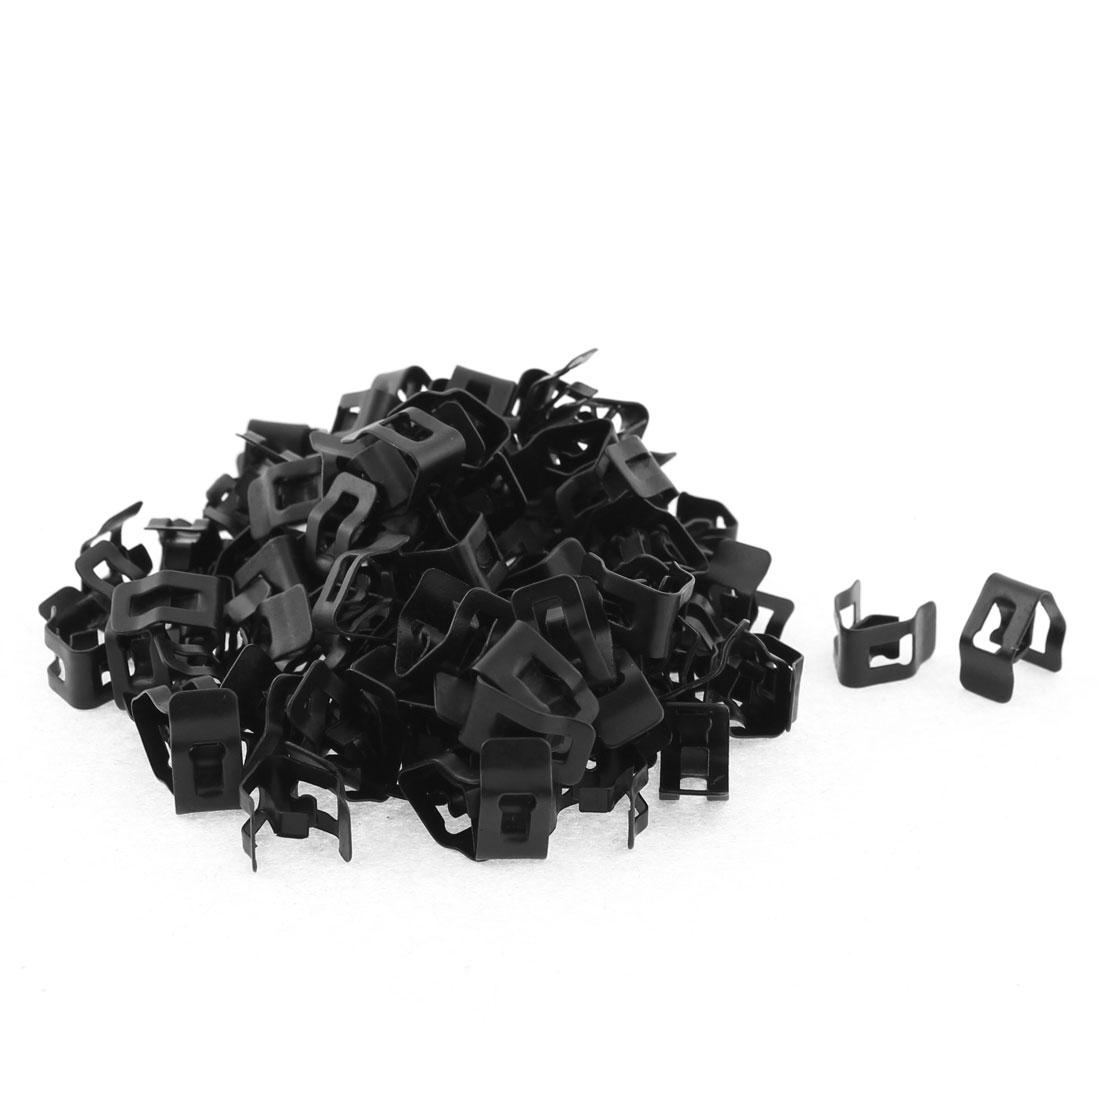 100Pcs Black Auto Car Dash Dashboard Boot Metal Fastener